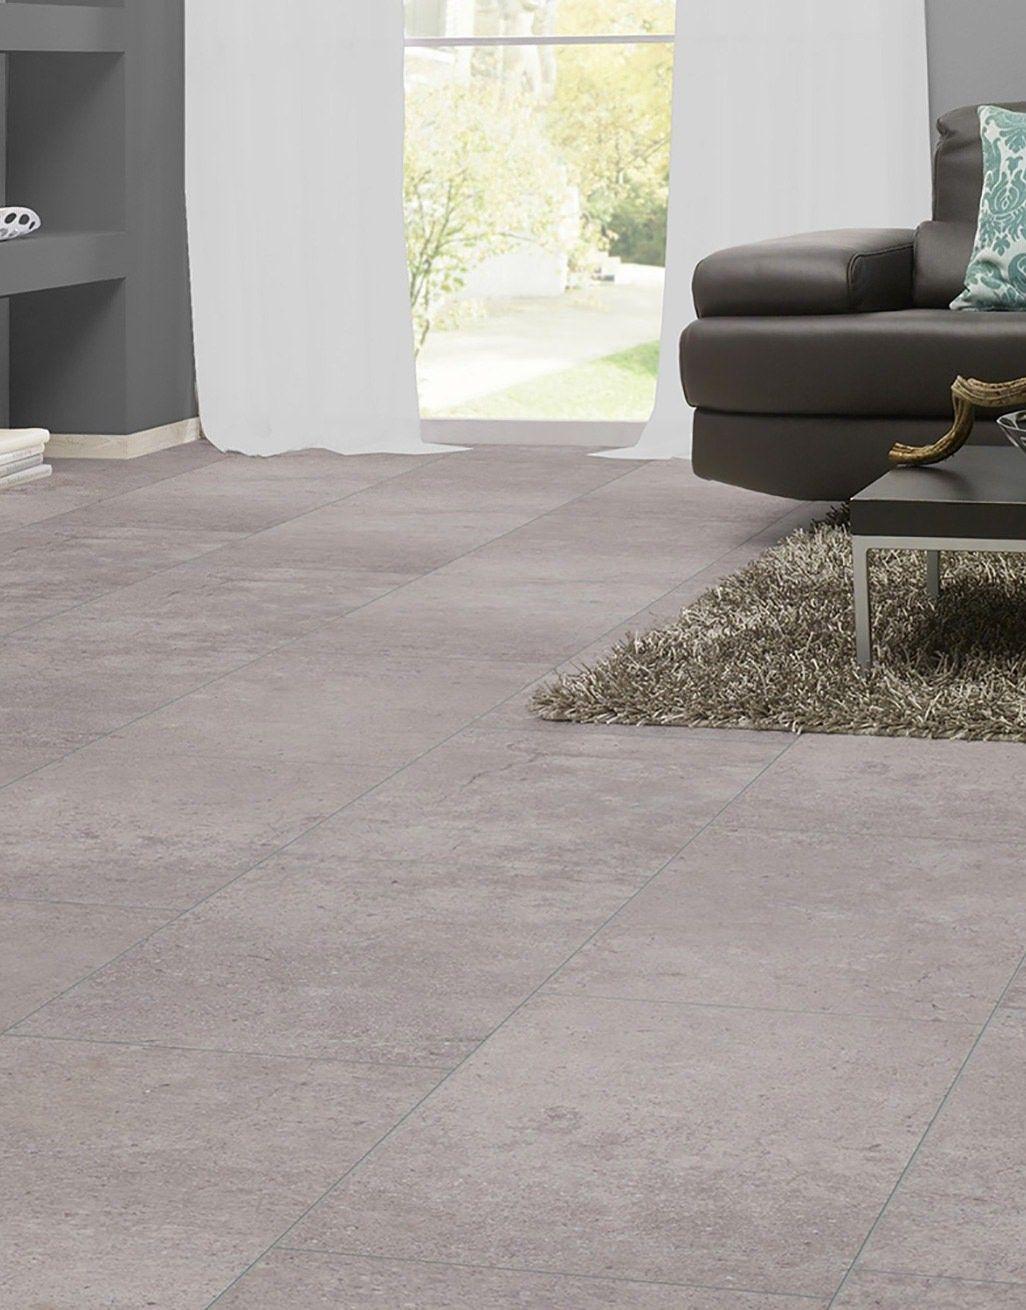 Verona Tile Concrete Laminate, Cement Effect Laminate Flooring